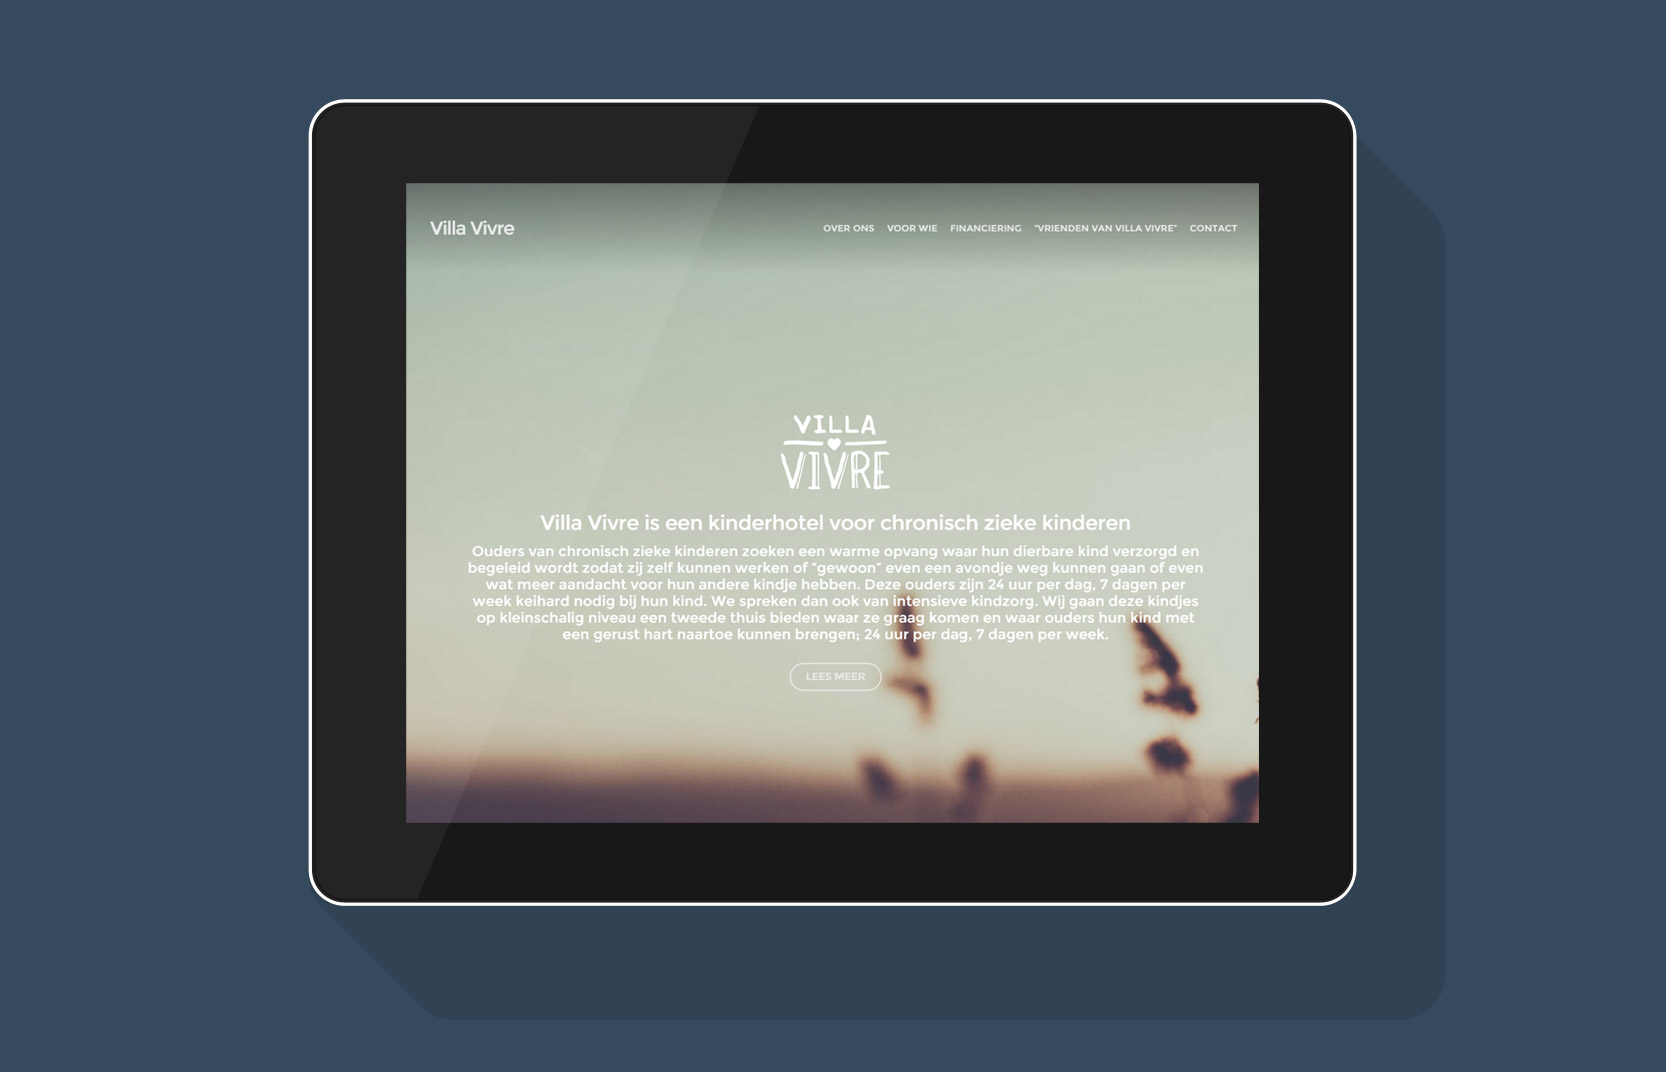 multi_villavivre_site0